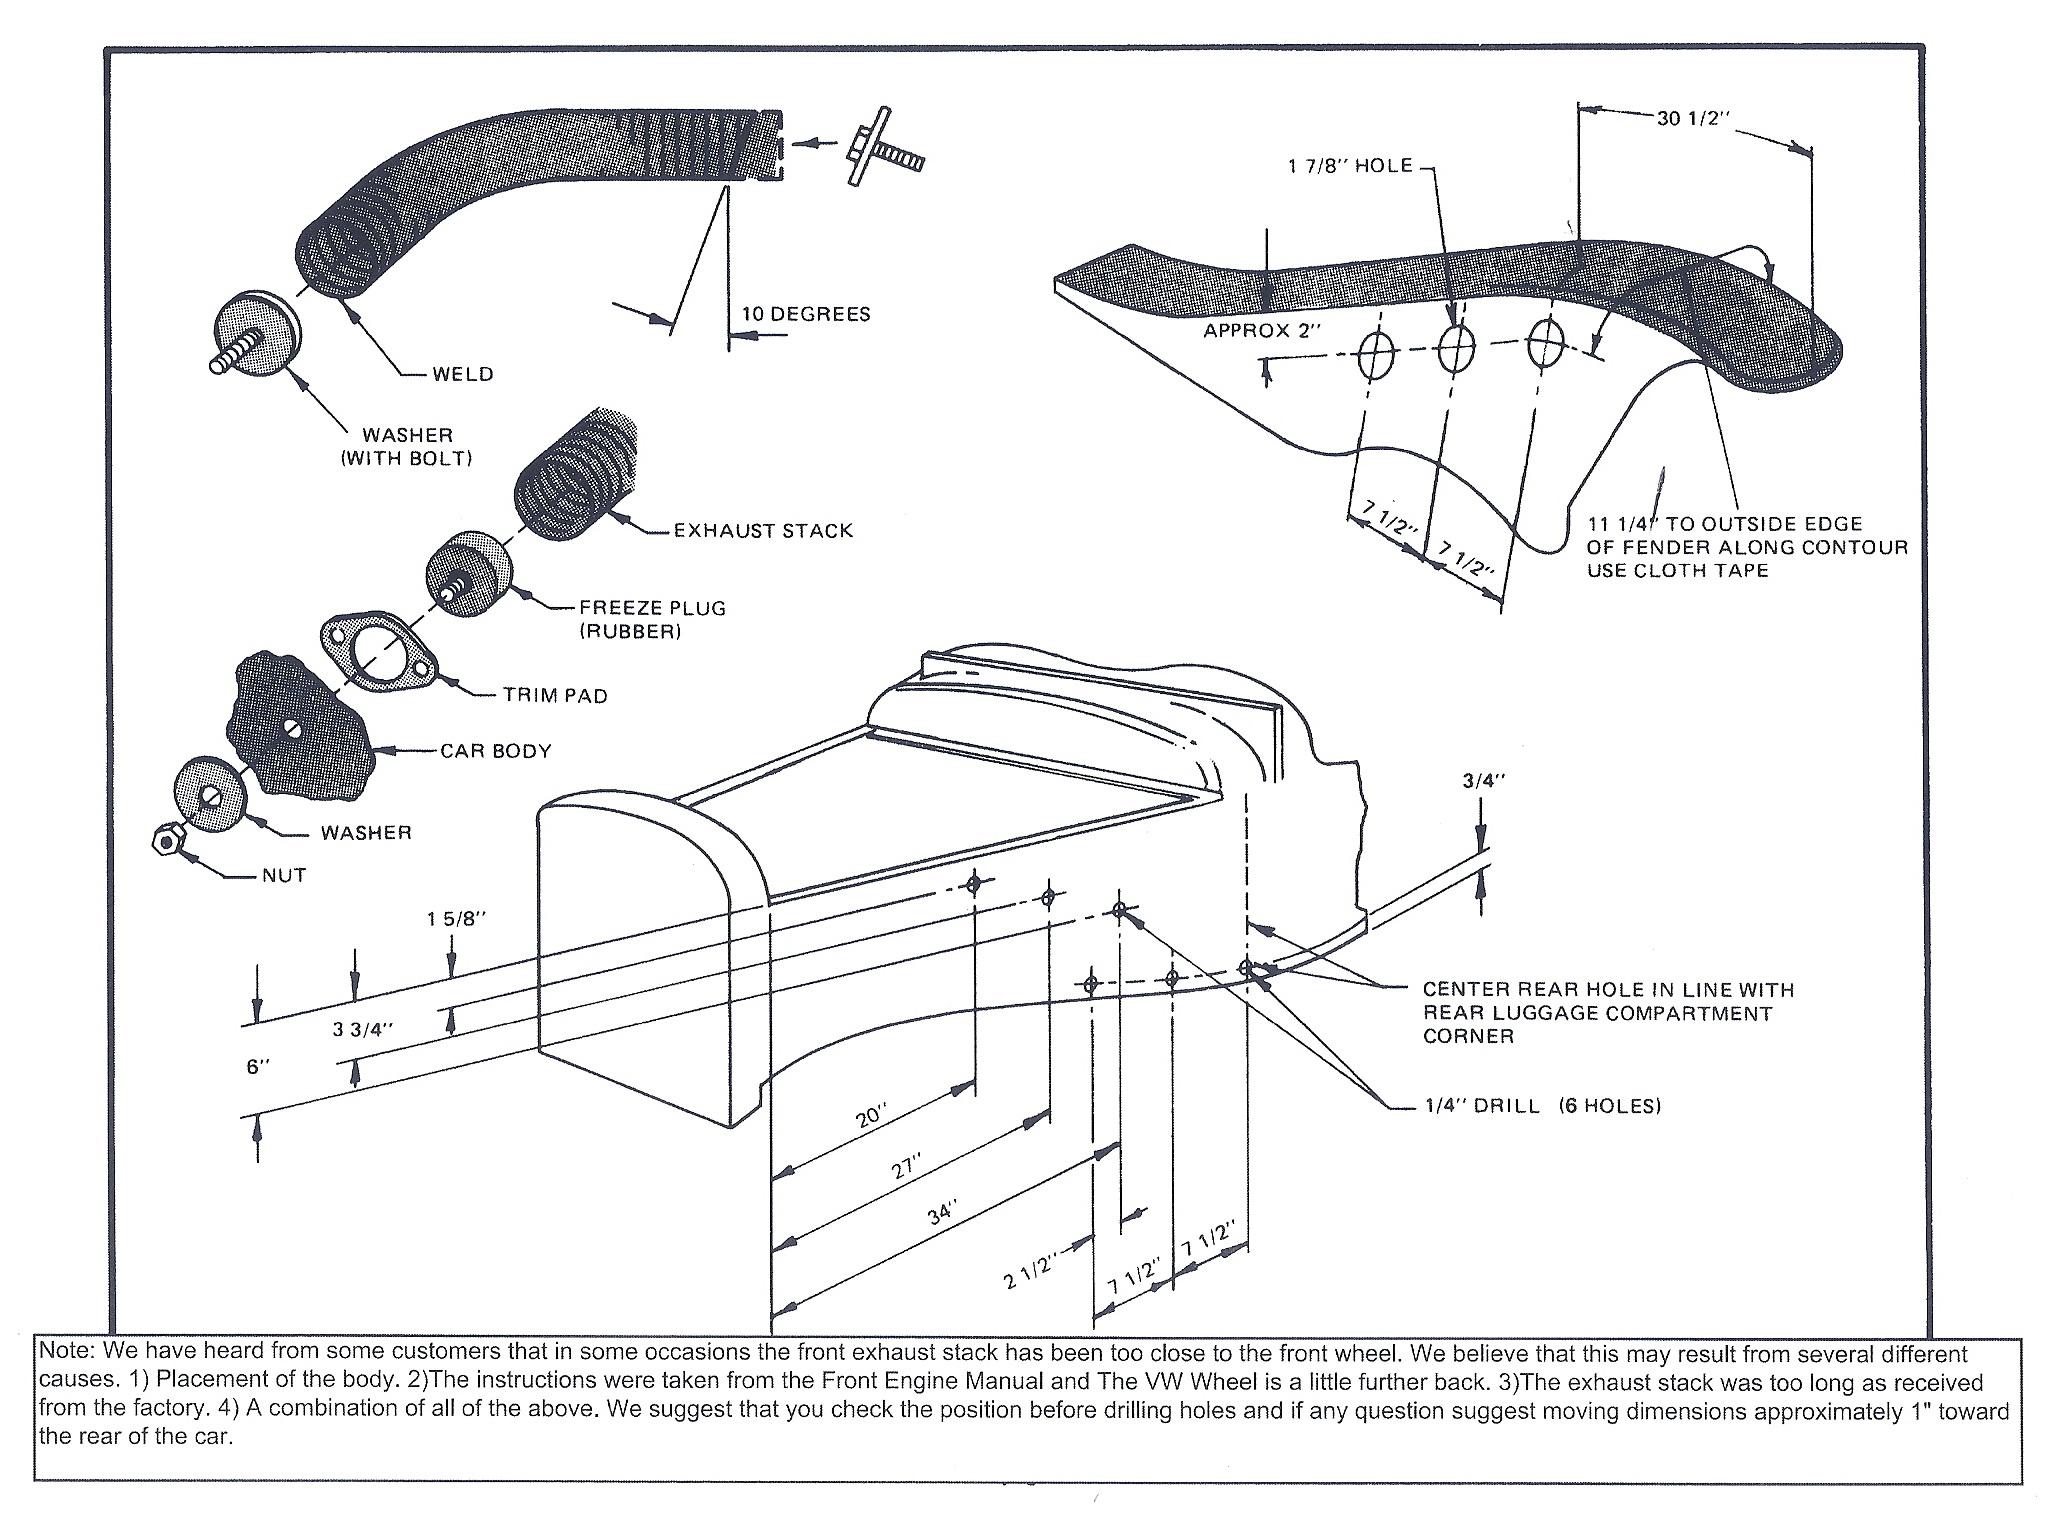 replacement parts for fiberfab mg td replica fiberfab. Black Bedroom Furniture Sets. Home Design Ideas